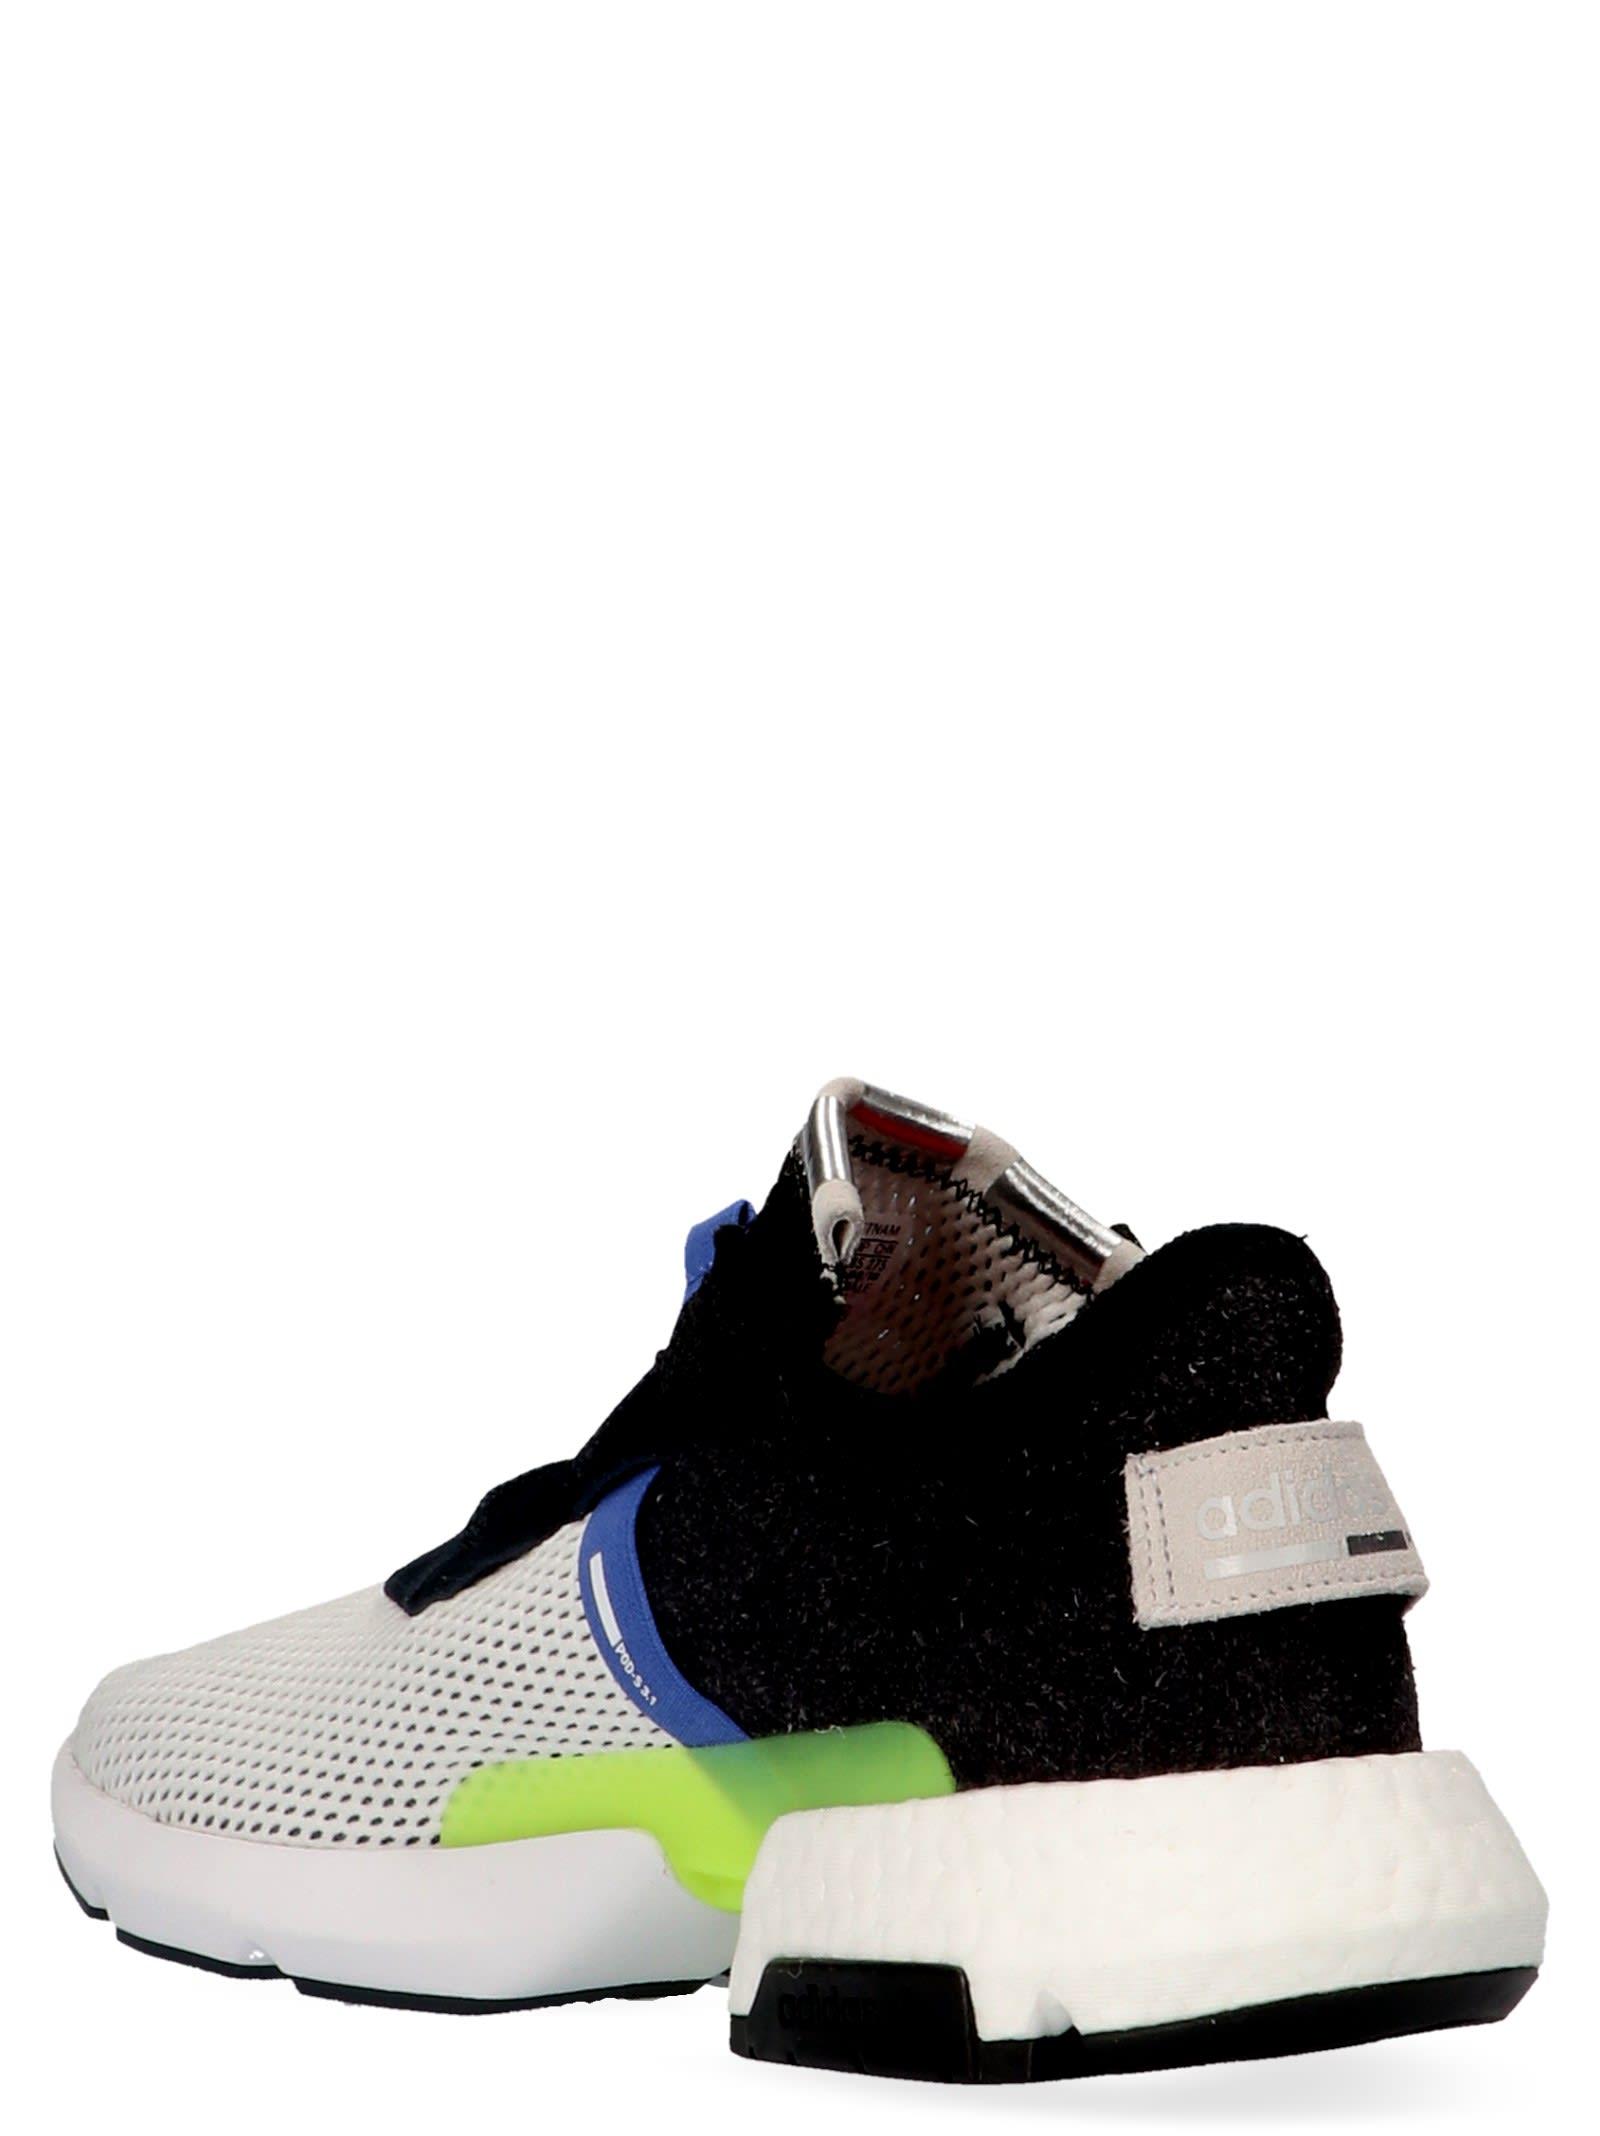 Best price on the market at italist | Adidas Originals Adidas Originals 'pod s3.1' Shoes